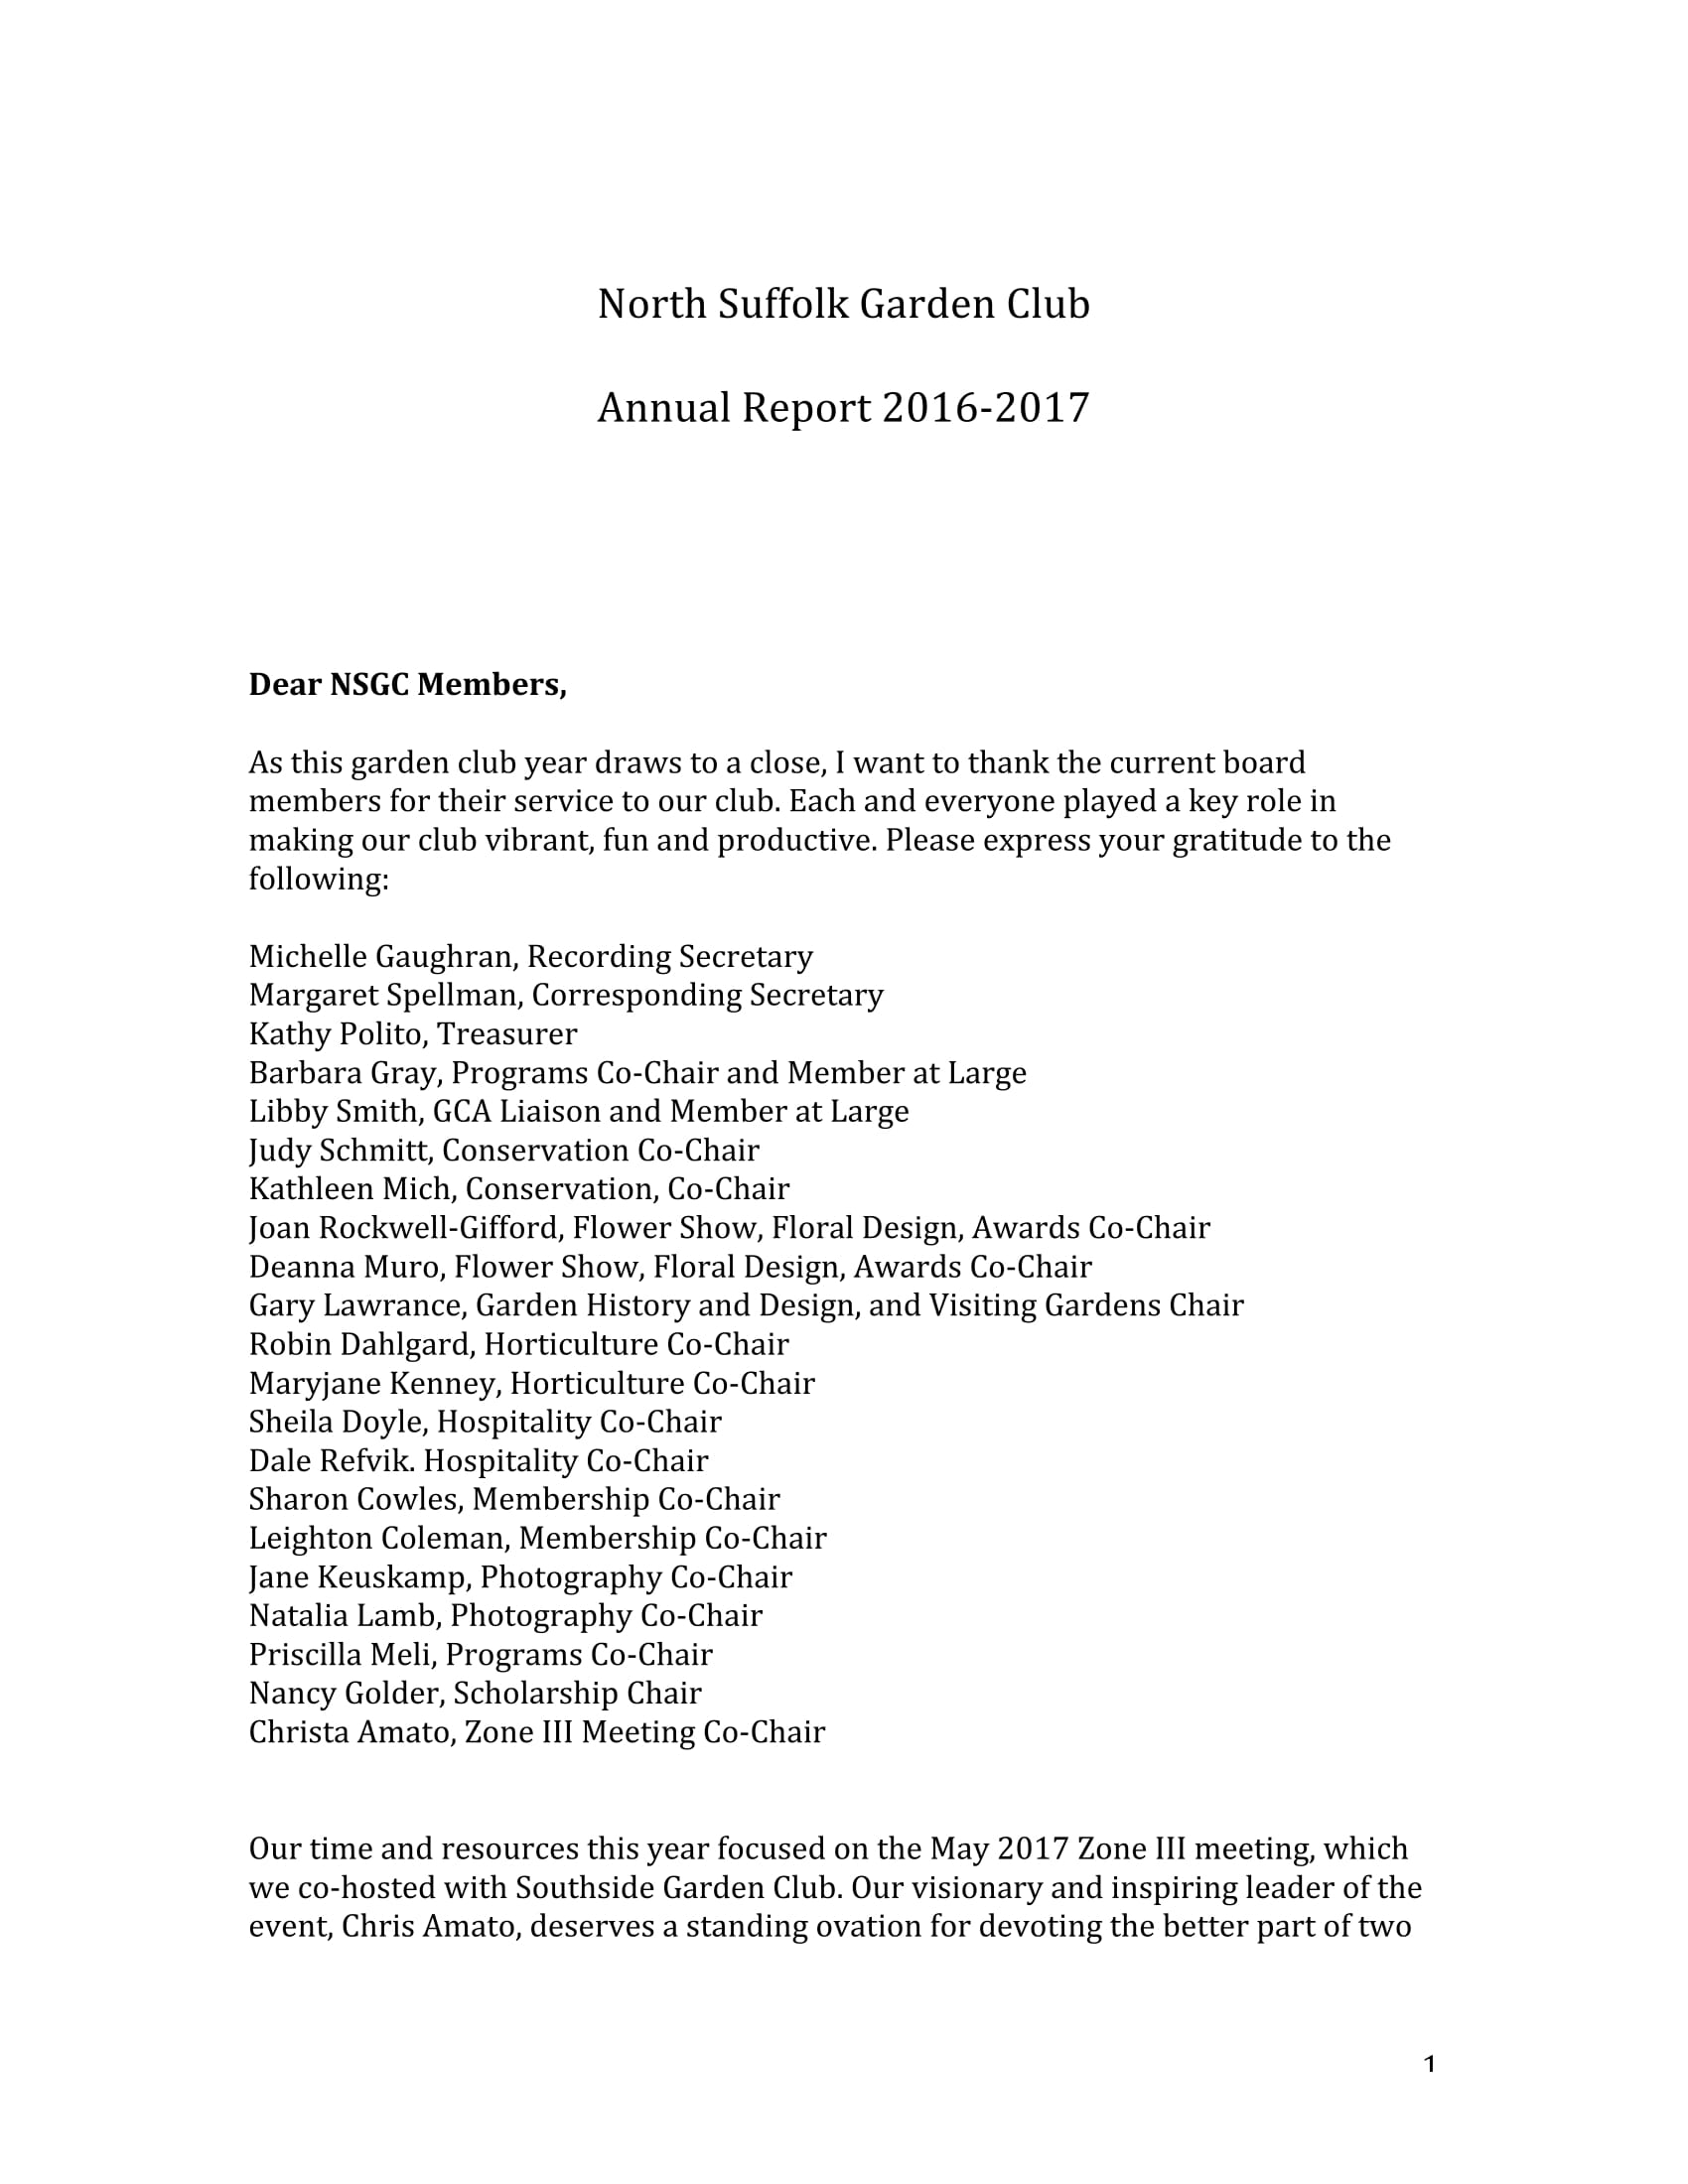 NSGC Annual Report-01.jpg